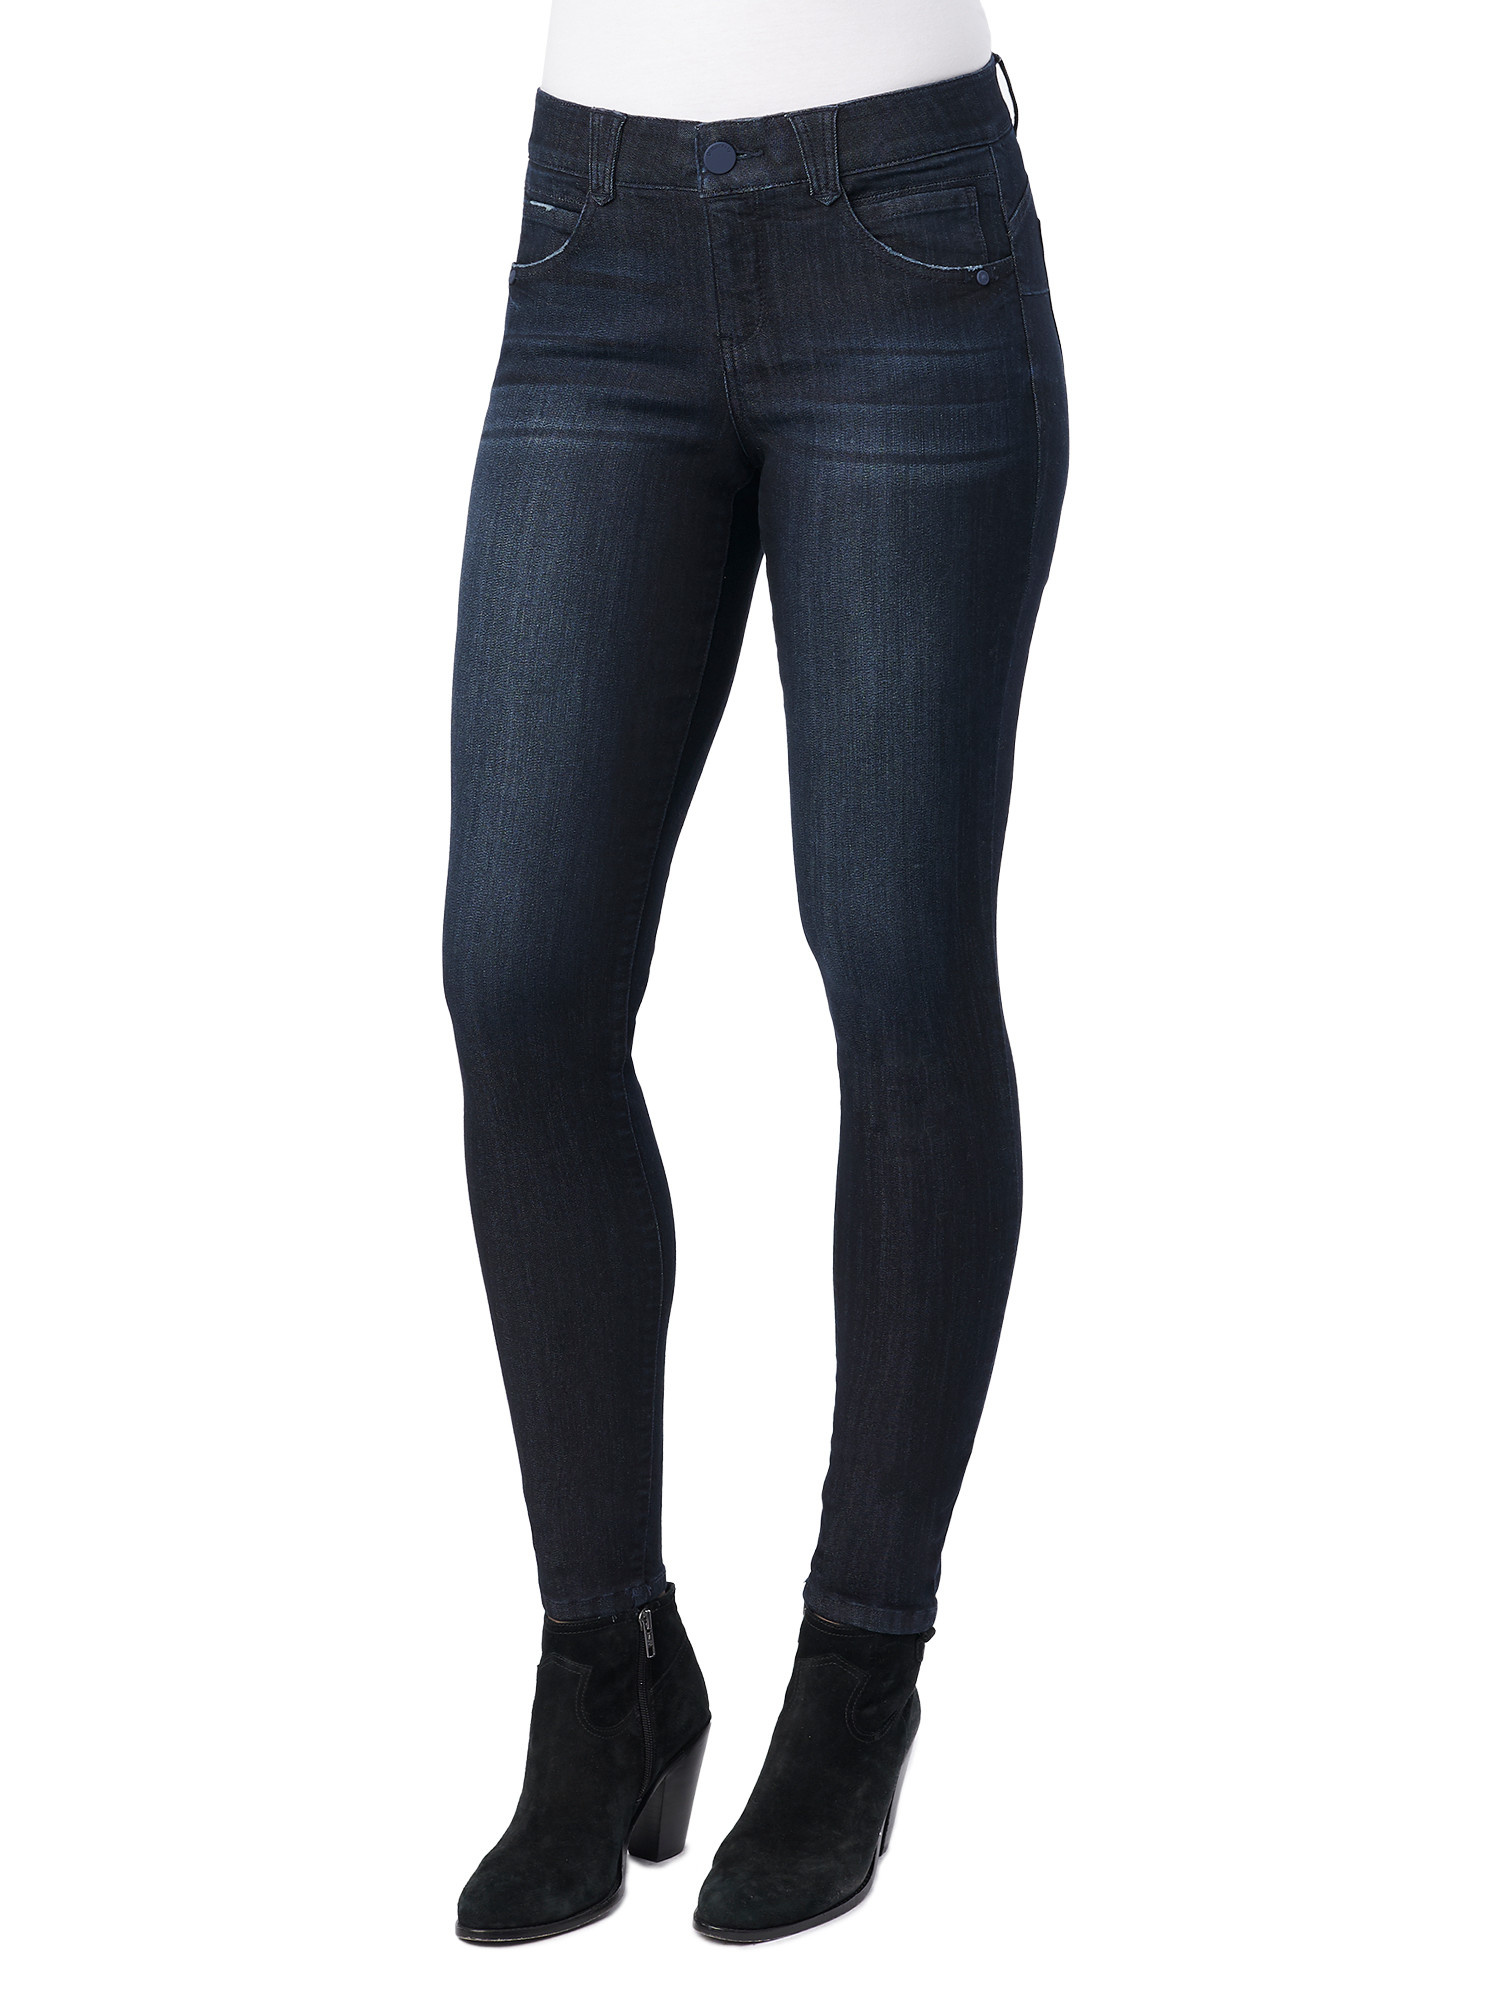 Democracy Core AB-Solution Indigo Denim Jegging Jeans